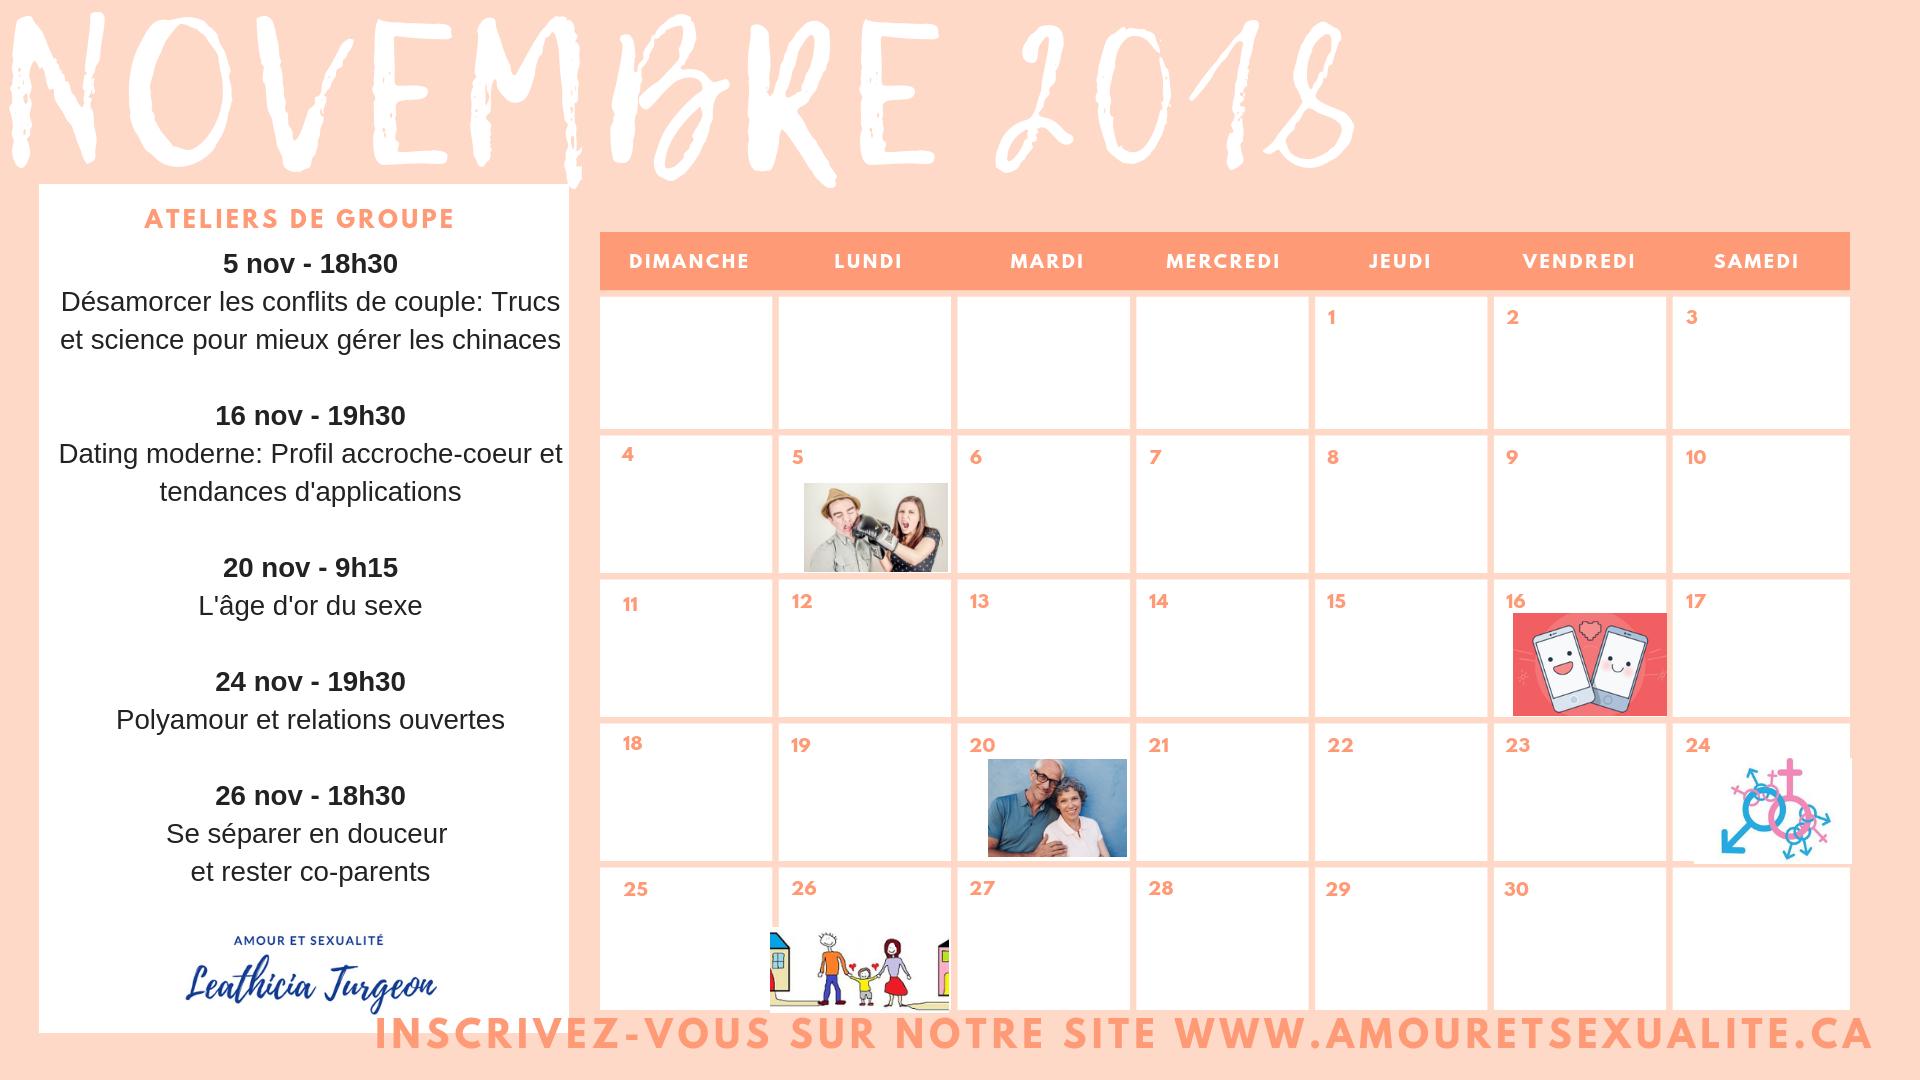 Calendrier des activités oct-nov-déc 2018 (3)